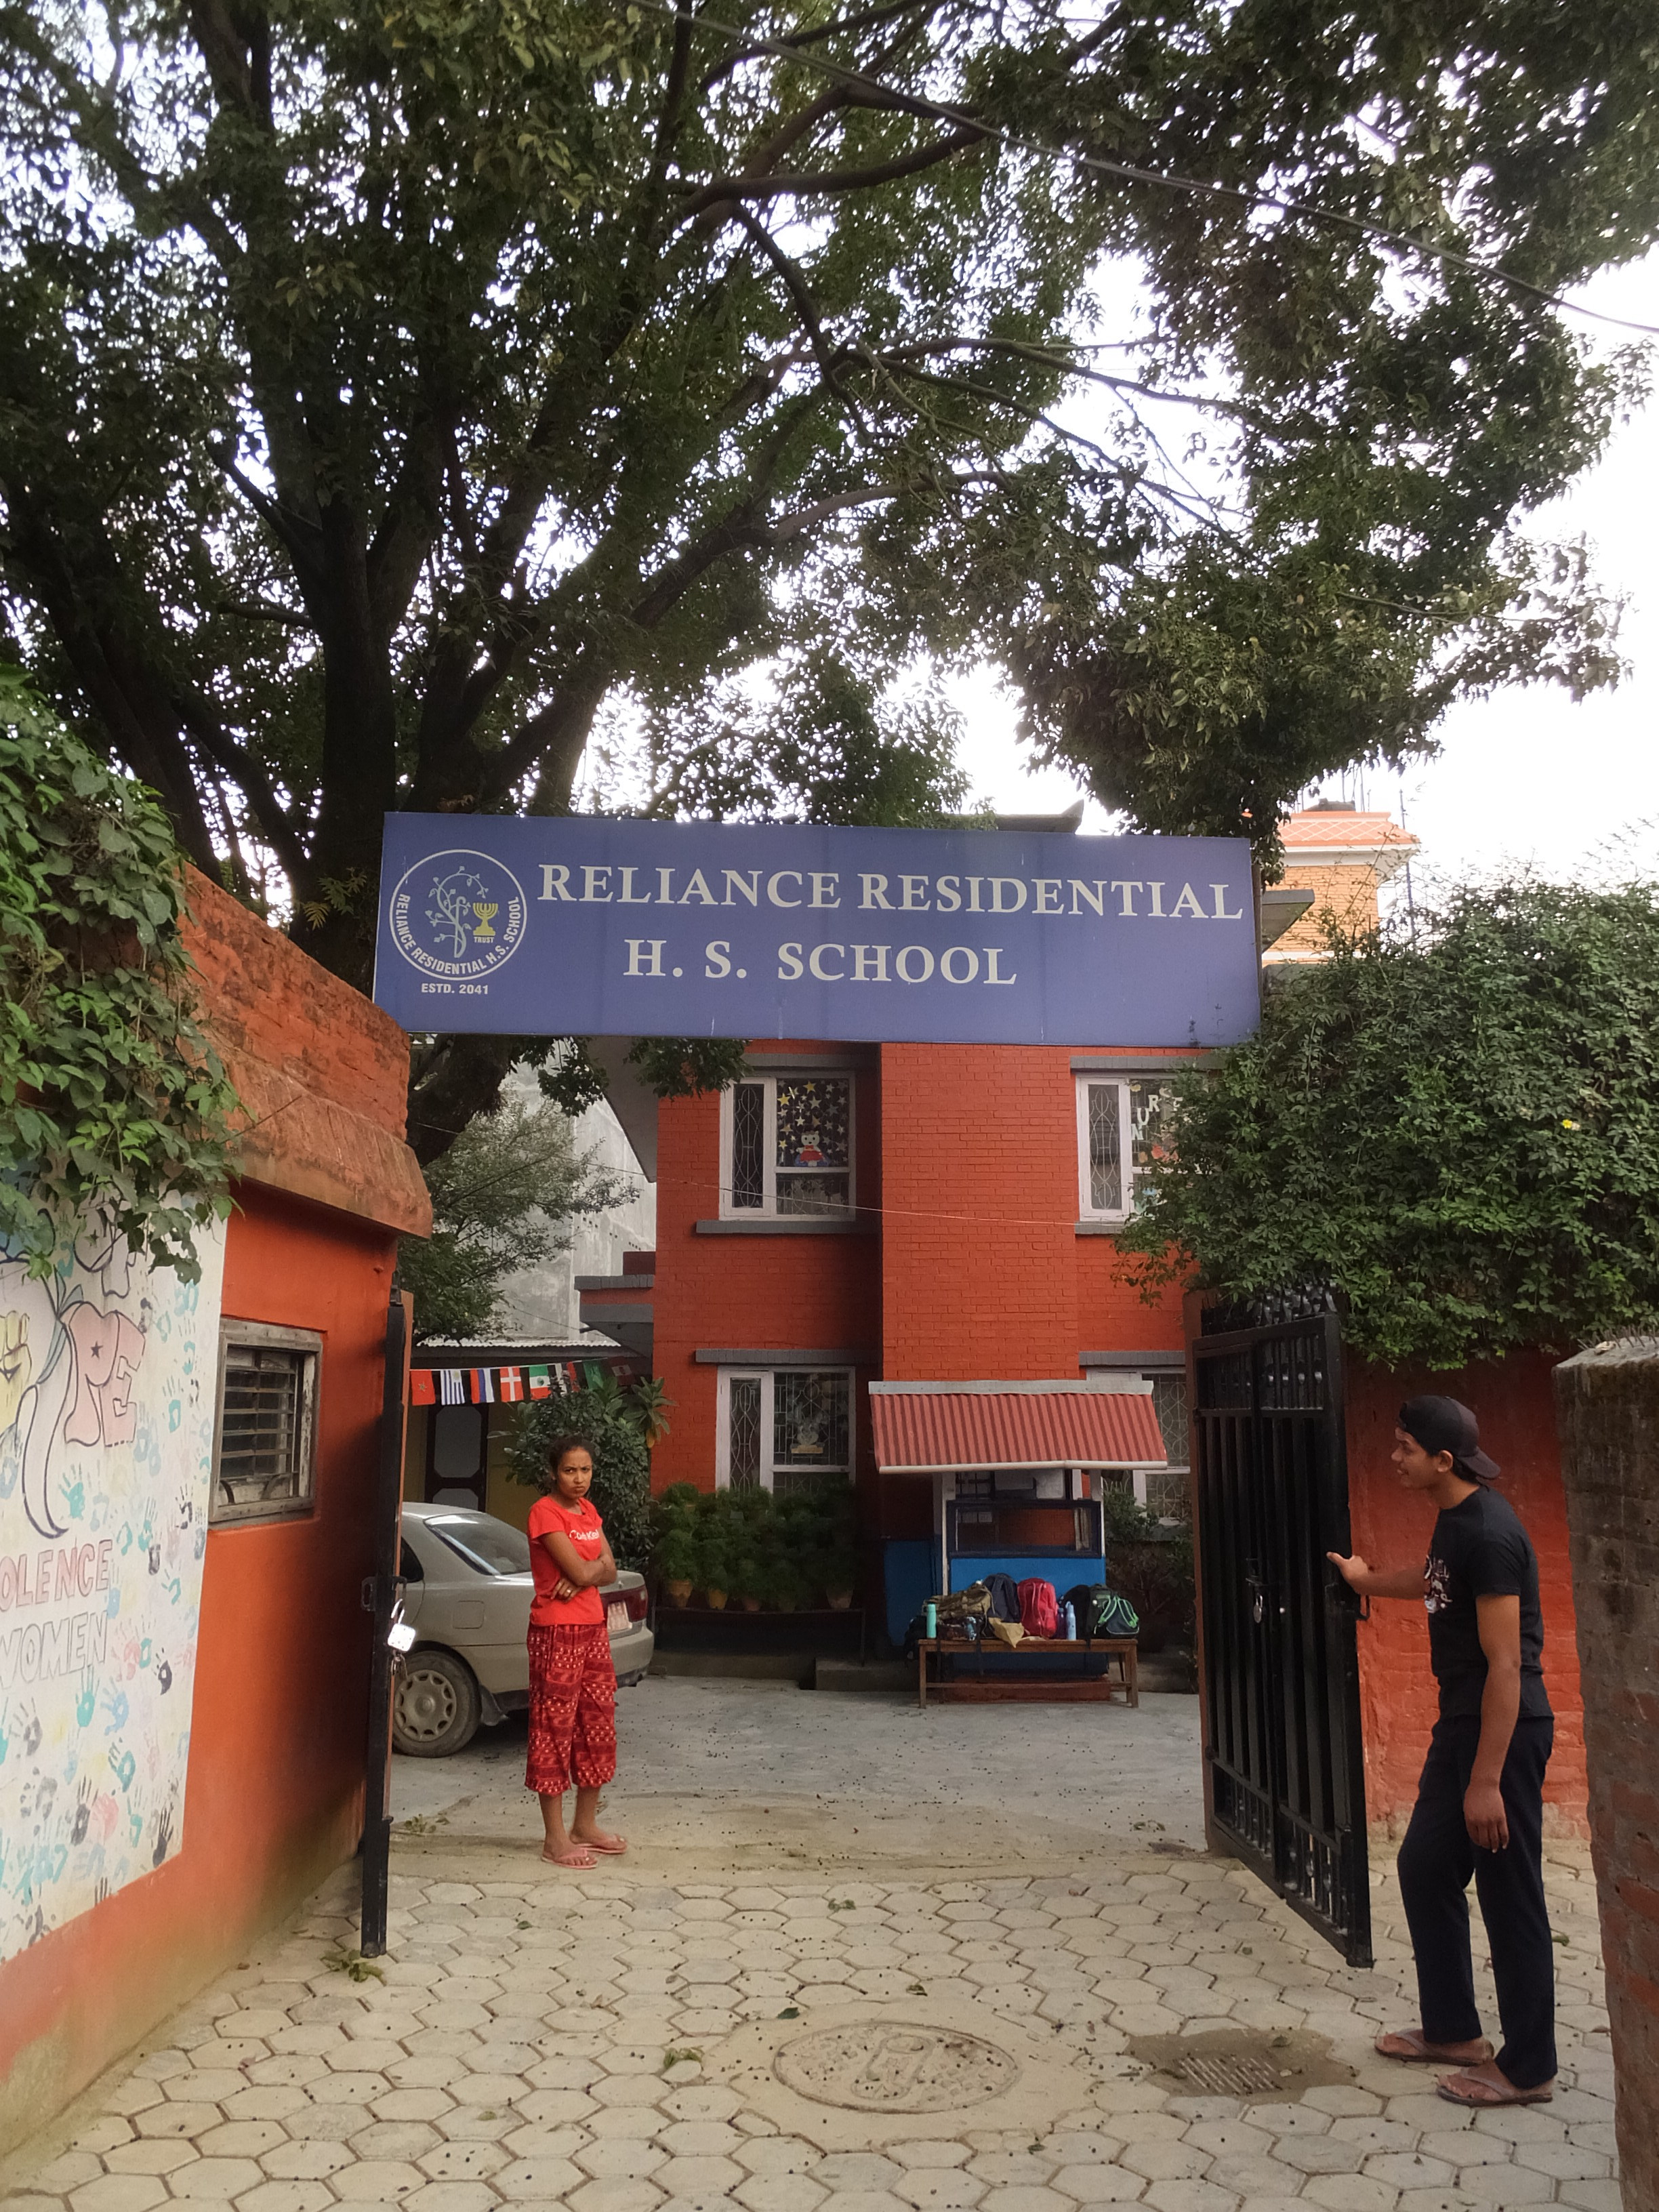 Reliance School entrance